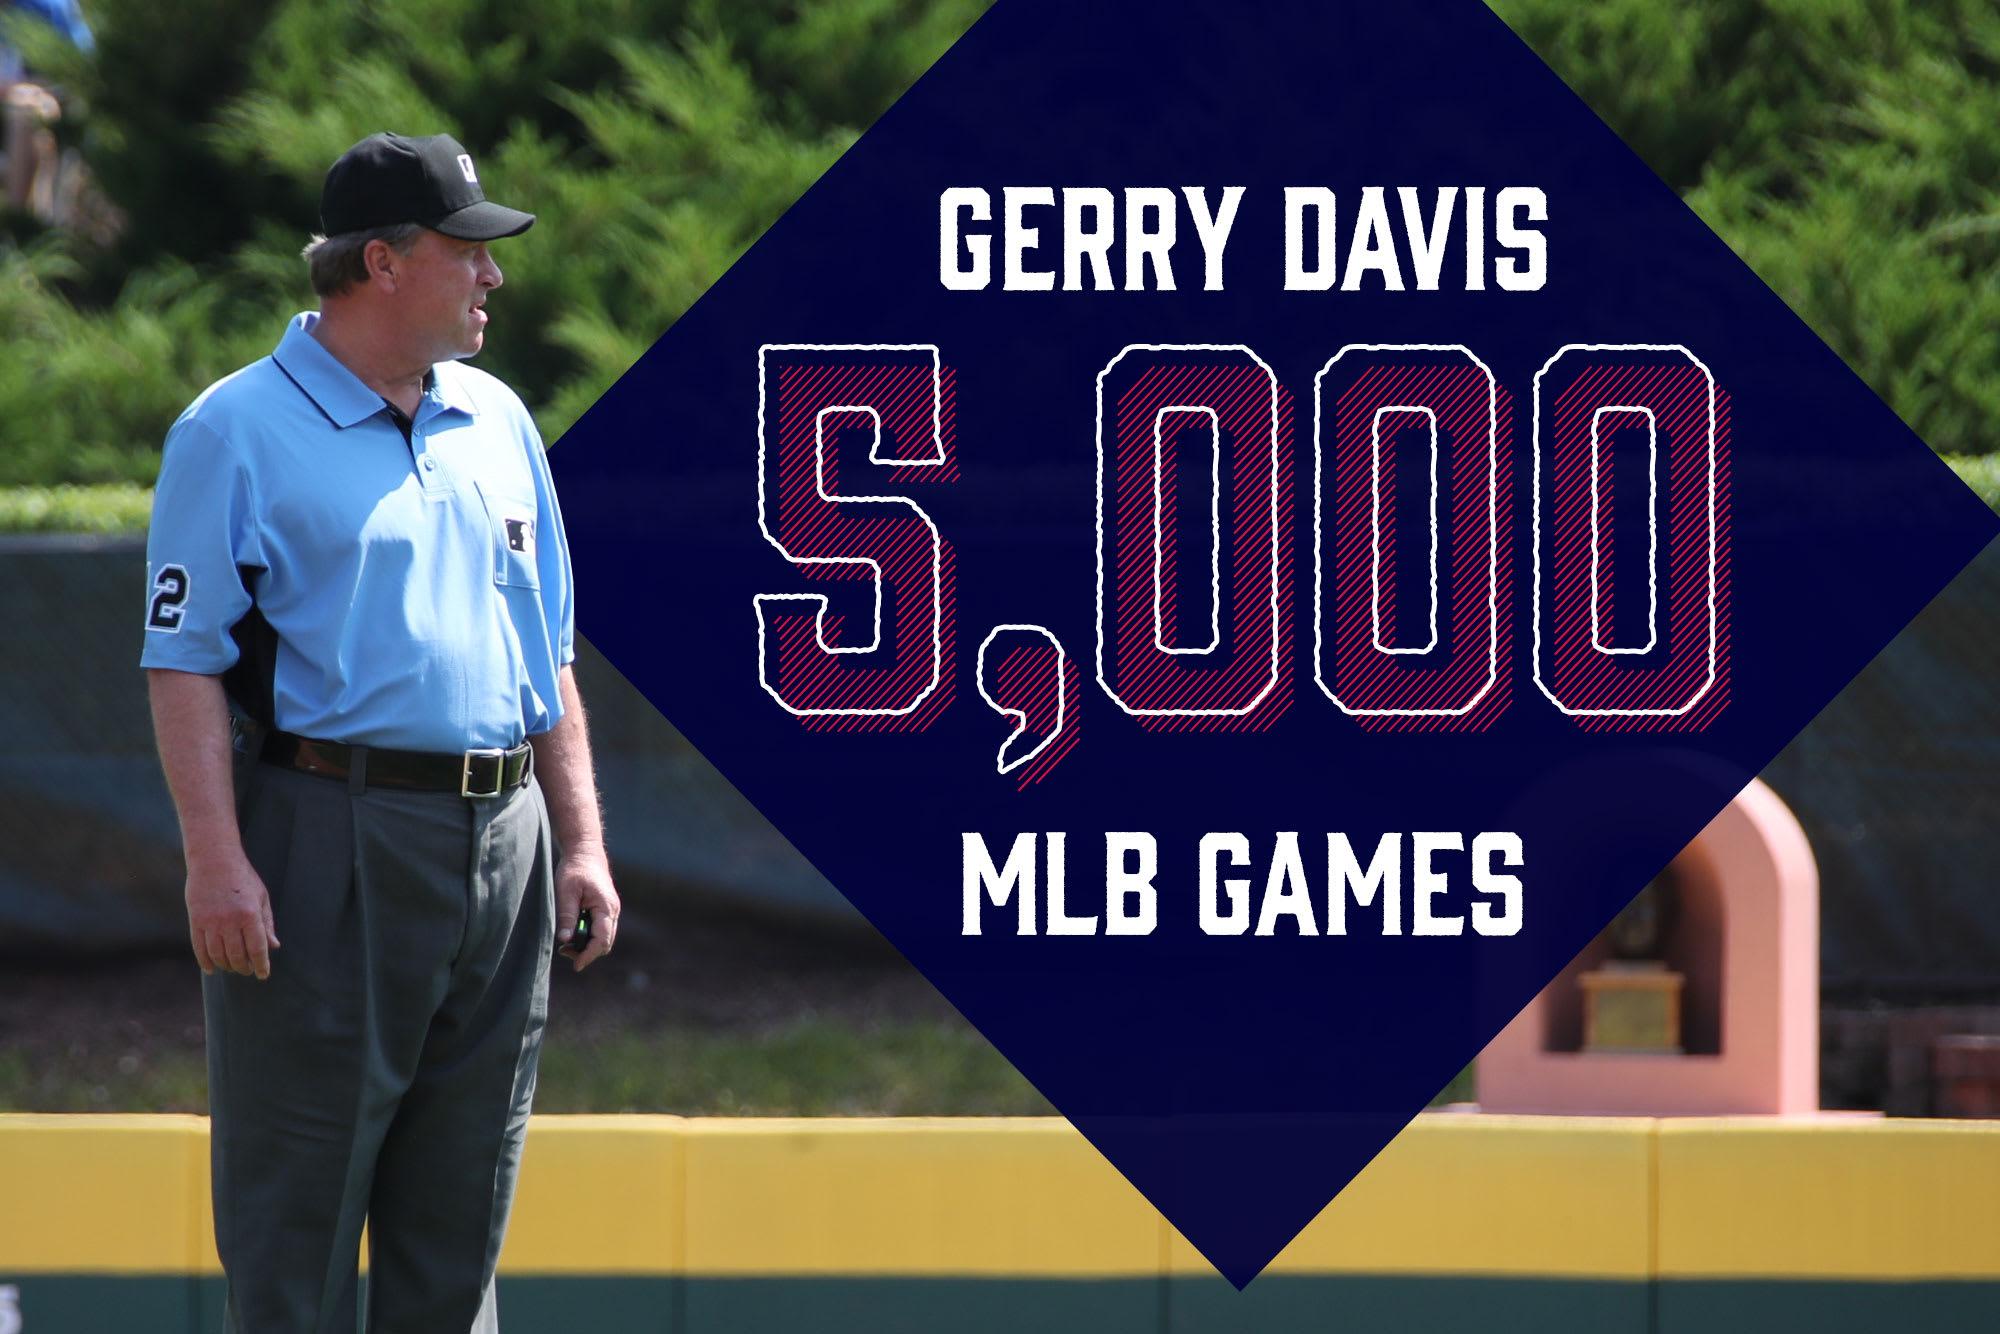 Gerry Davis 5,000 Games